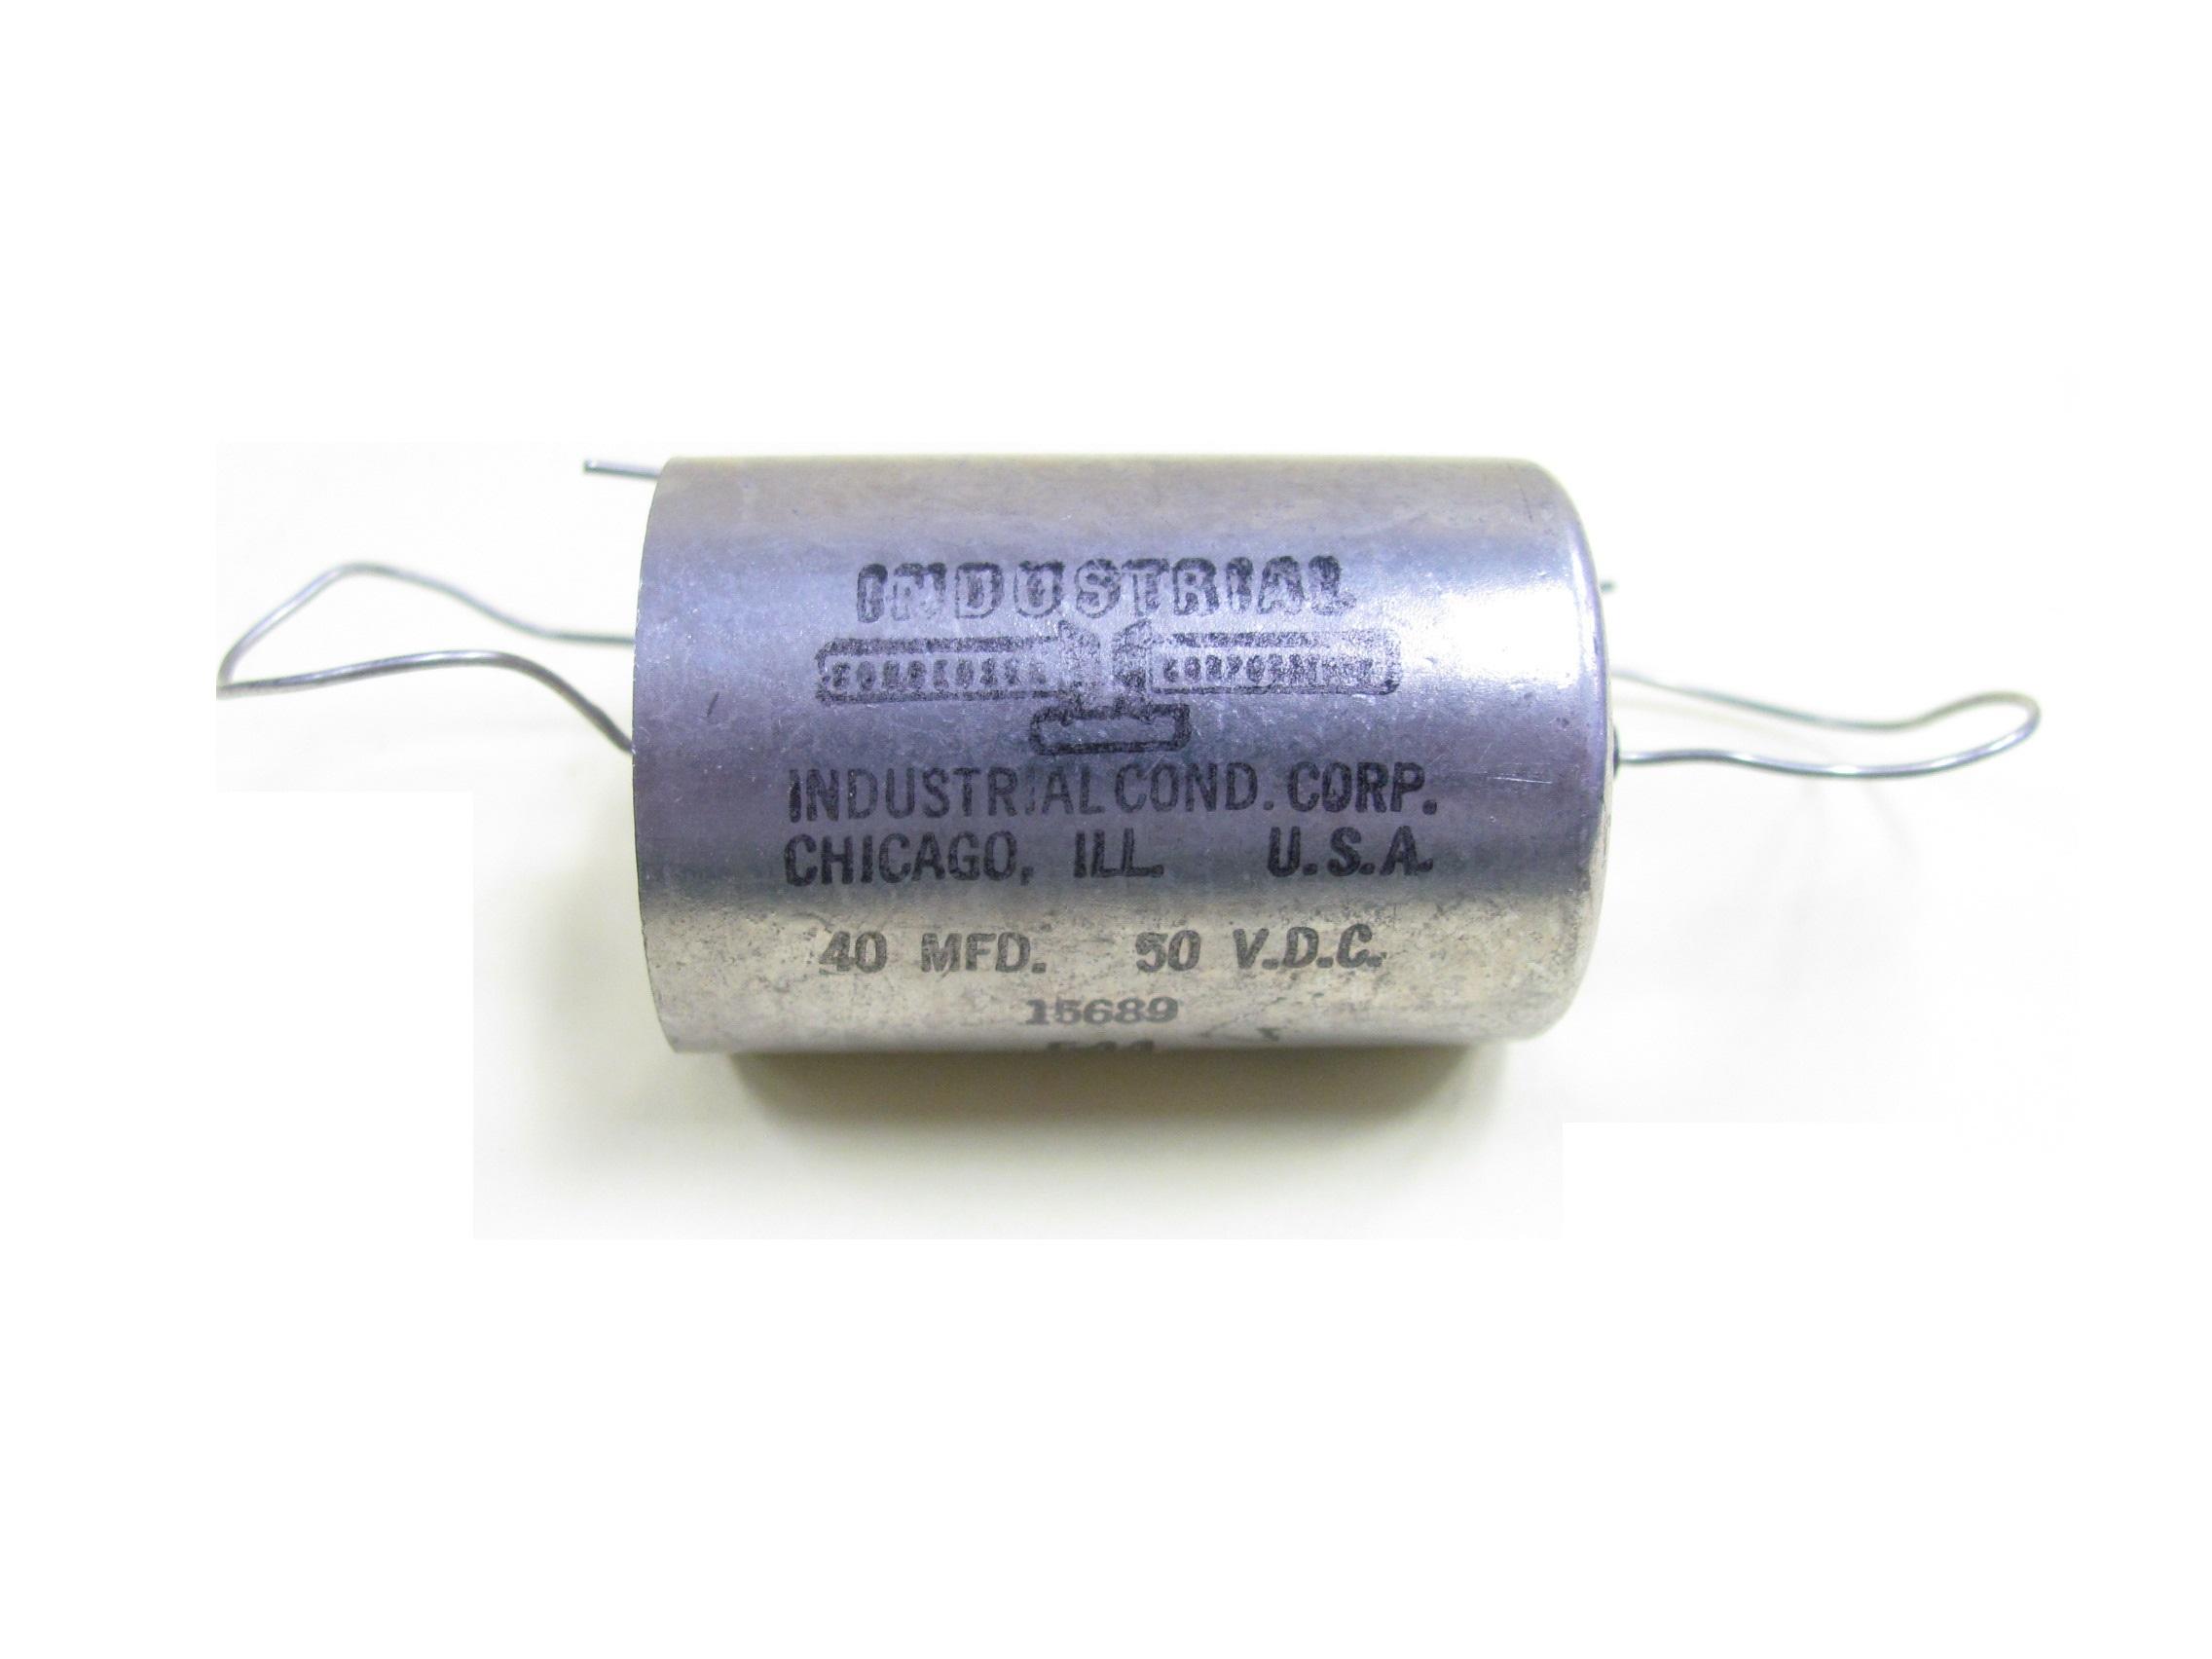 Industrial Condenser Capacitors